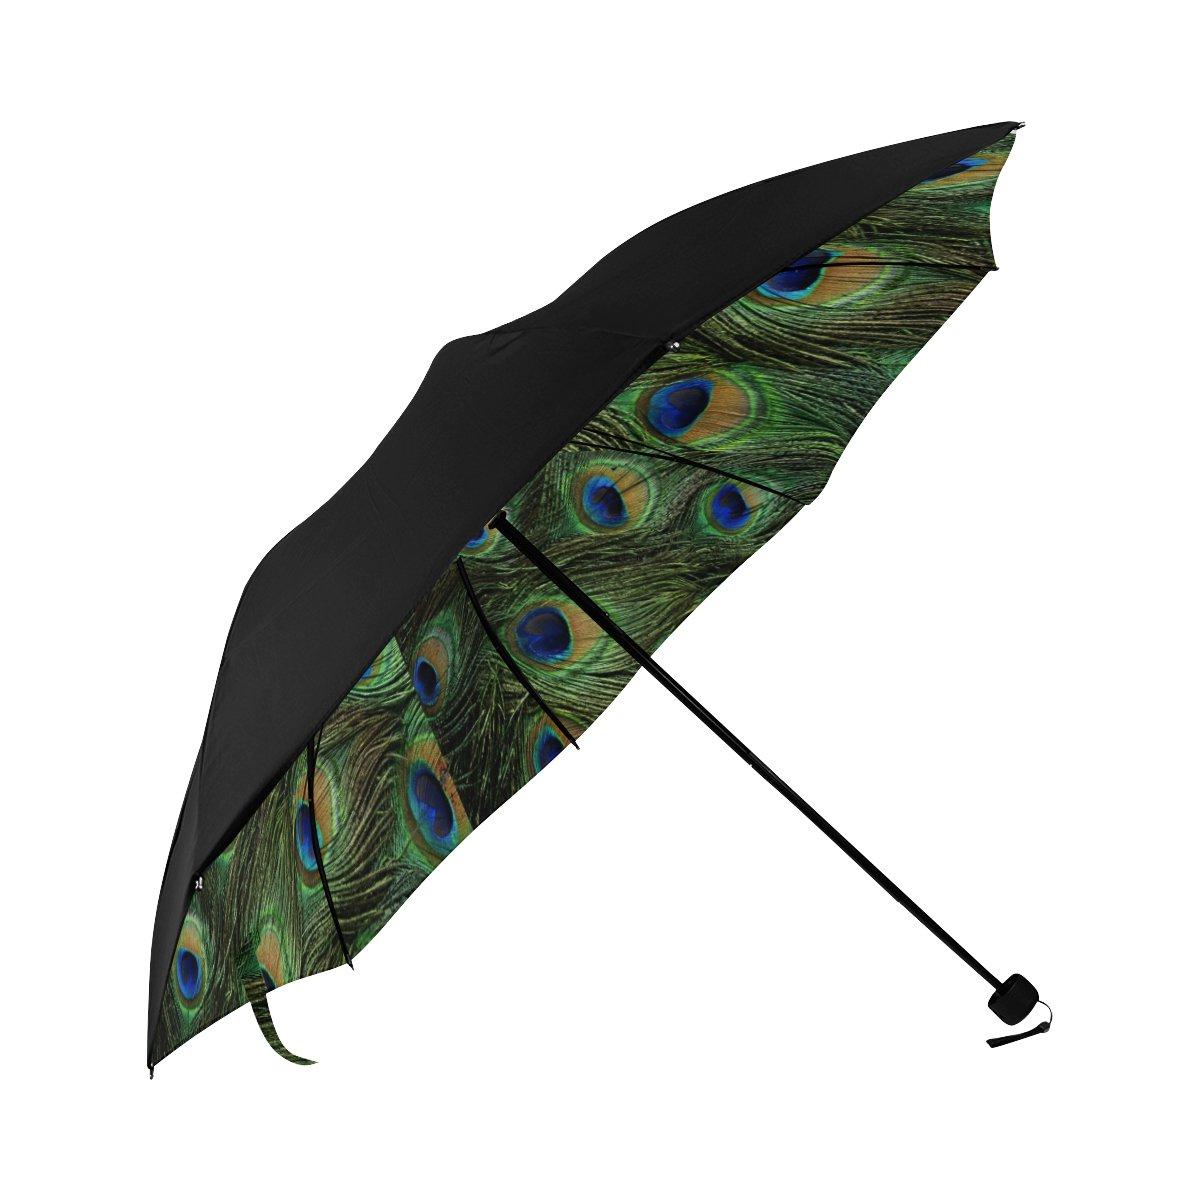 Peacock Patten Rain-Mate Travel Umbrella most popular BEST GIFT Portable Foldable Printed Umbrella